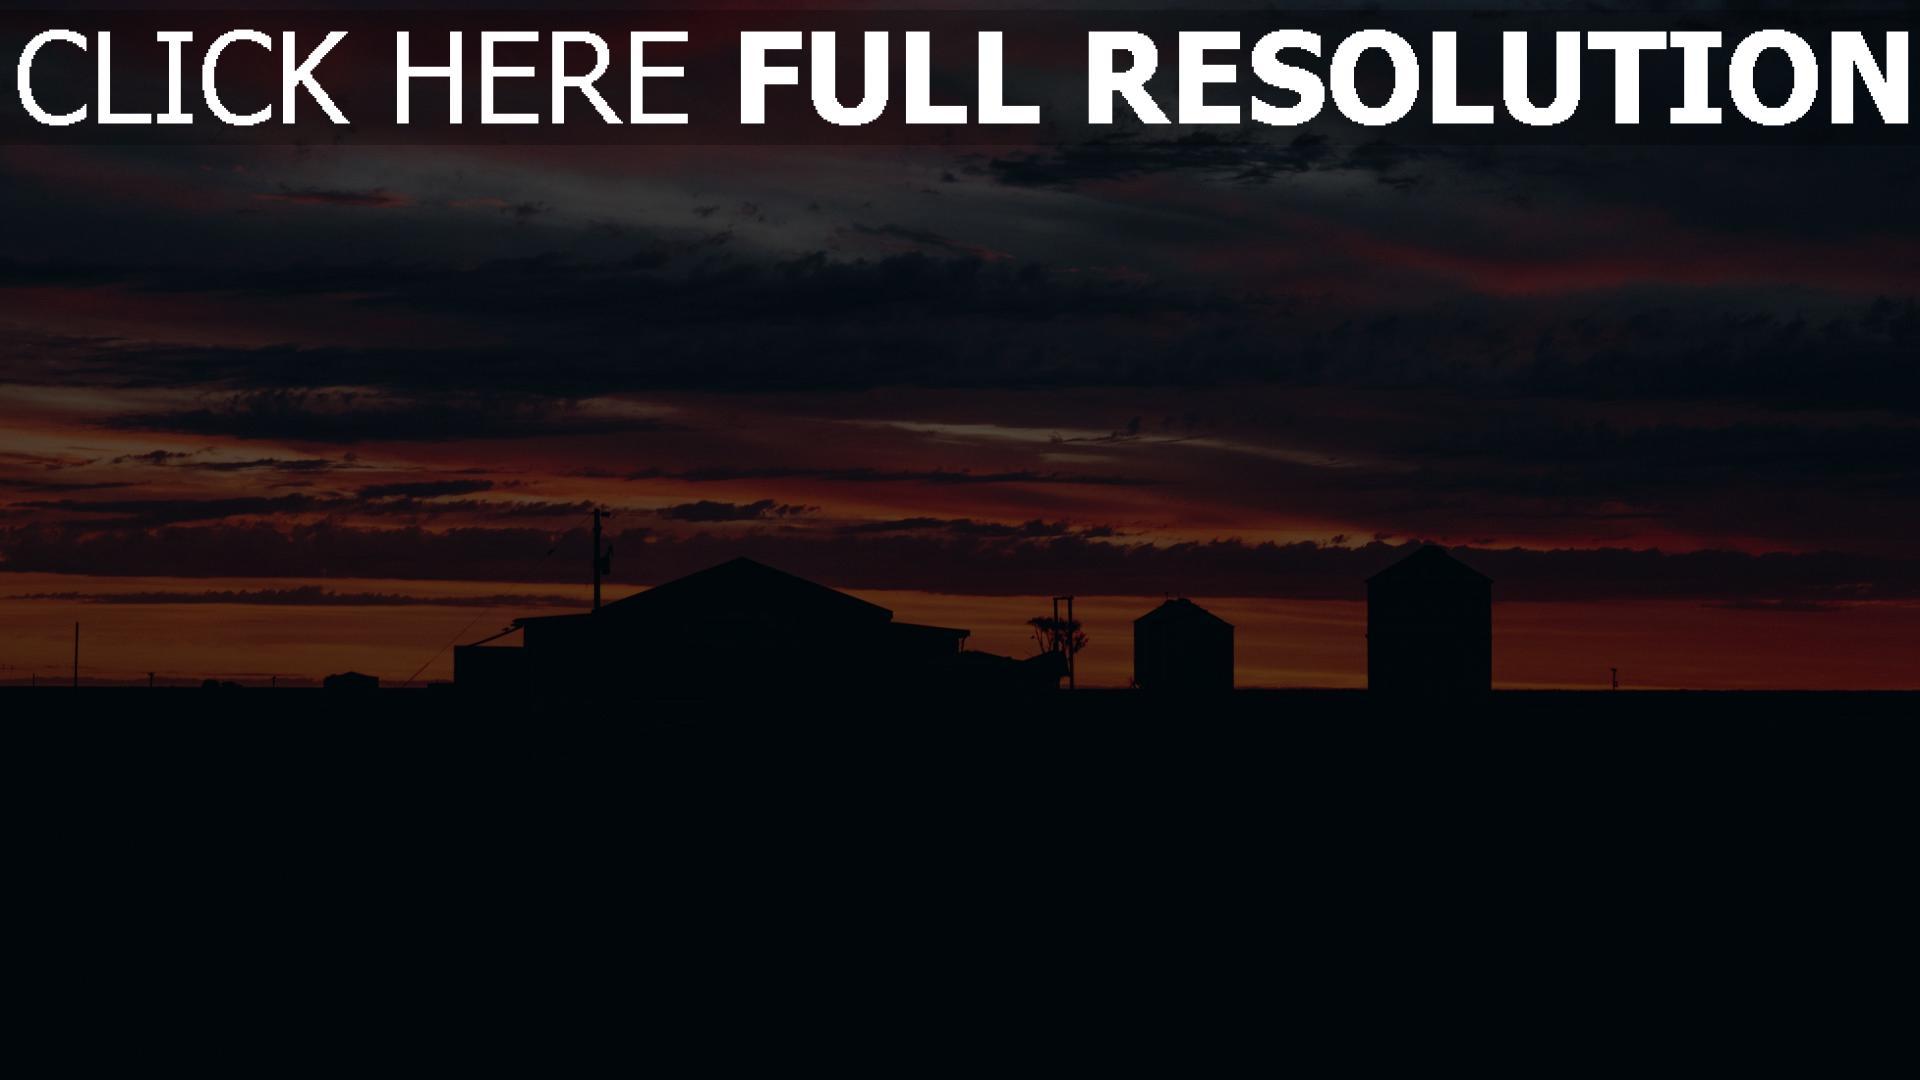 hd hintergrundbilder sonnenuntergang bewölkt wolken gebäude himmel 1920x1080